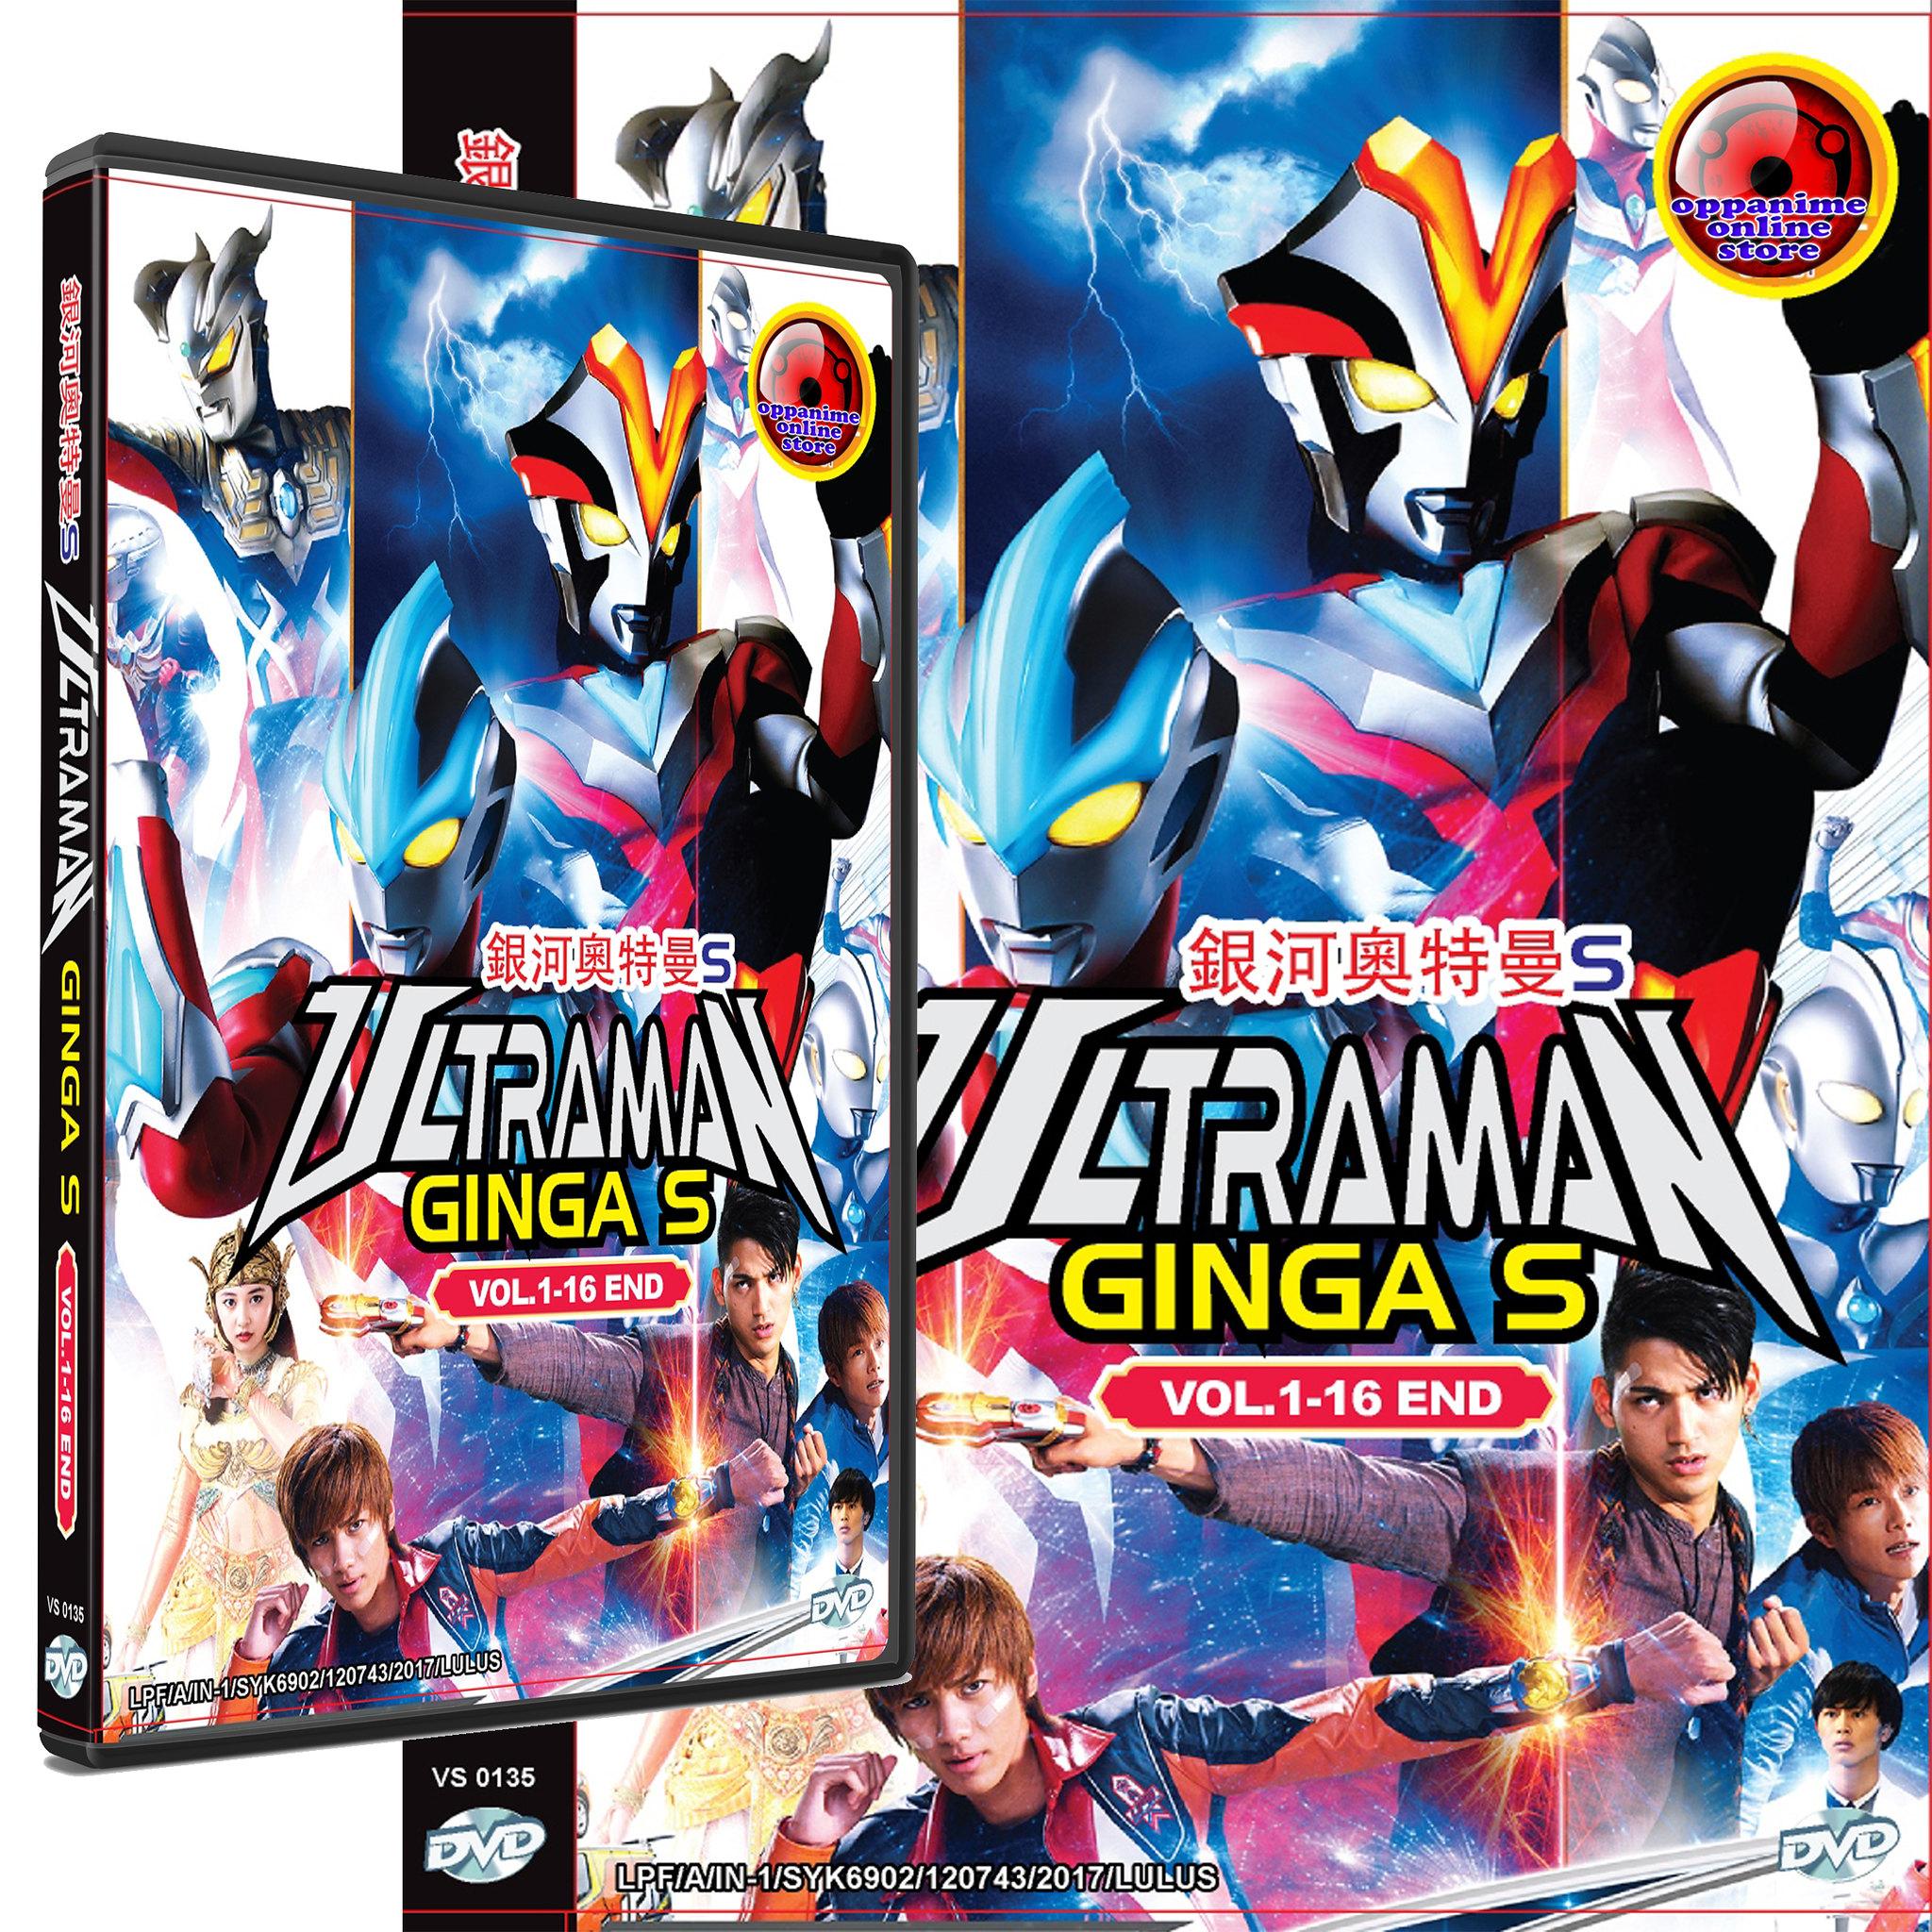 Ultraman Ginga S Vol.1-16 End